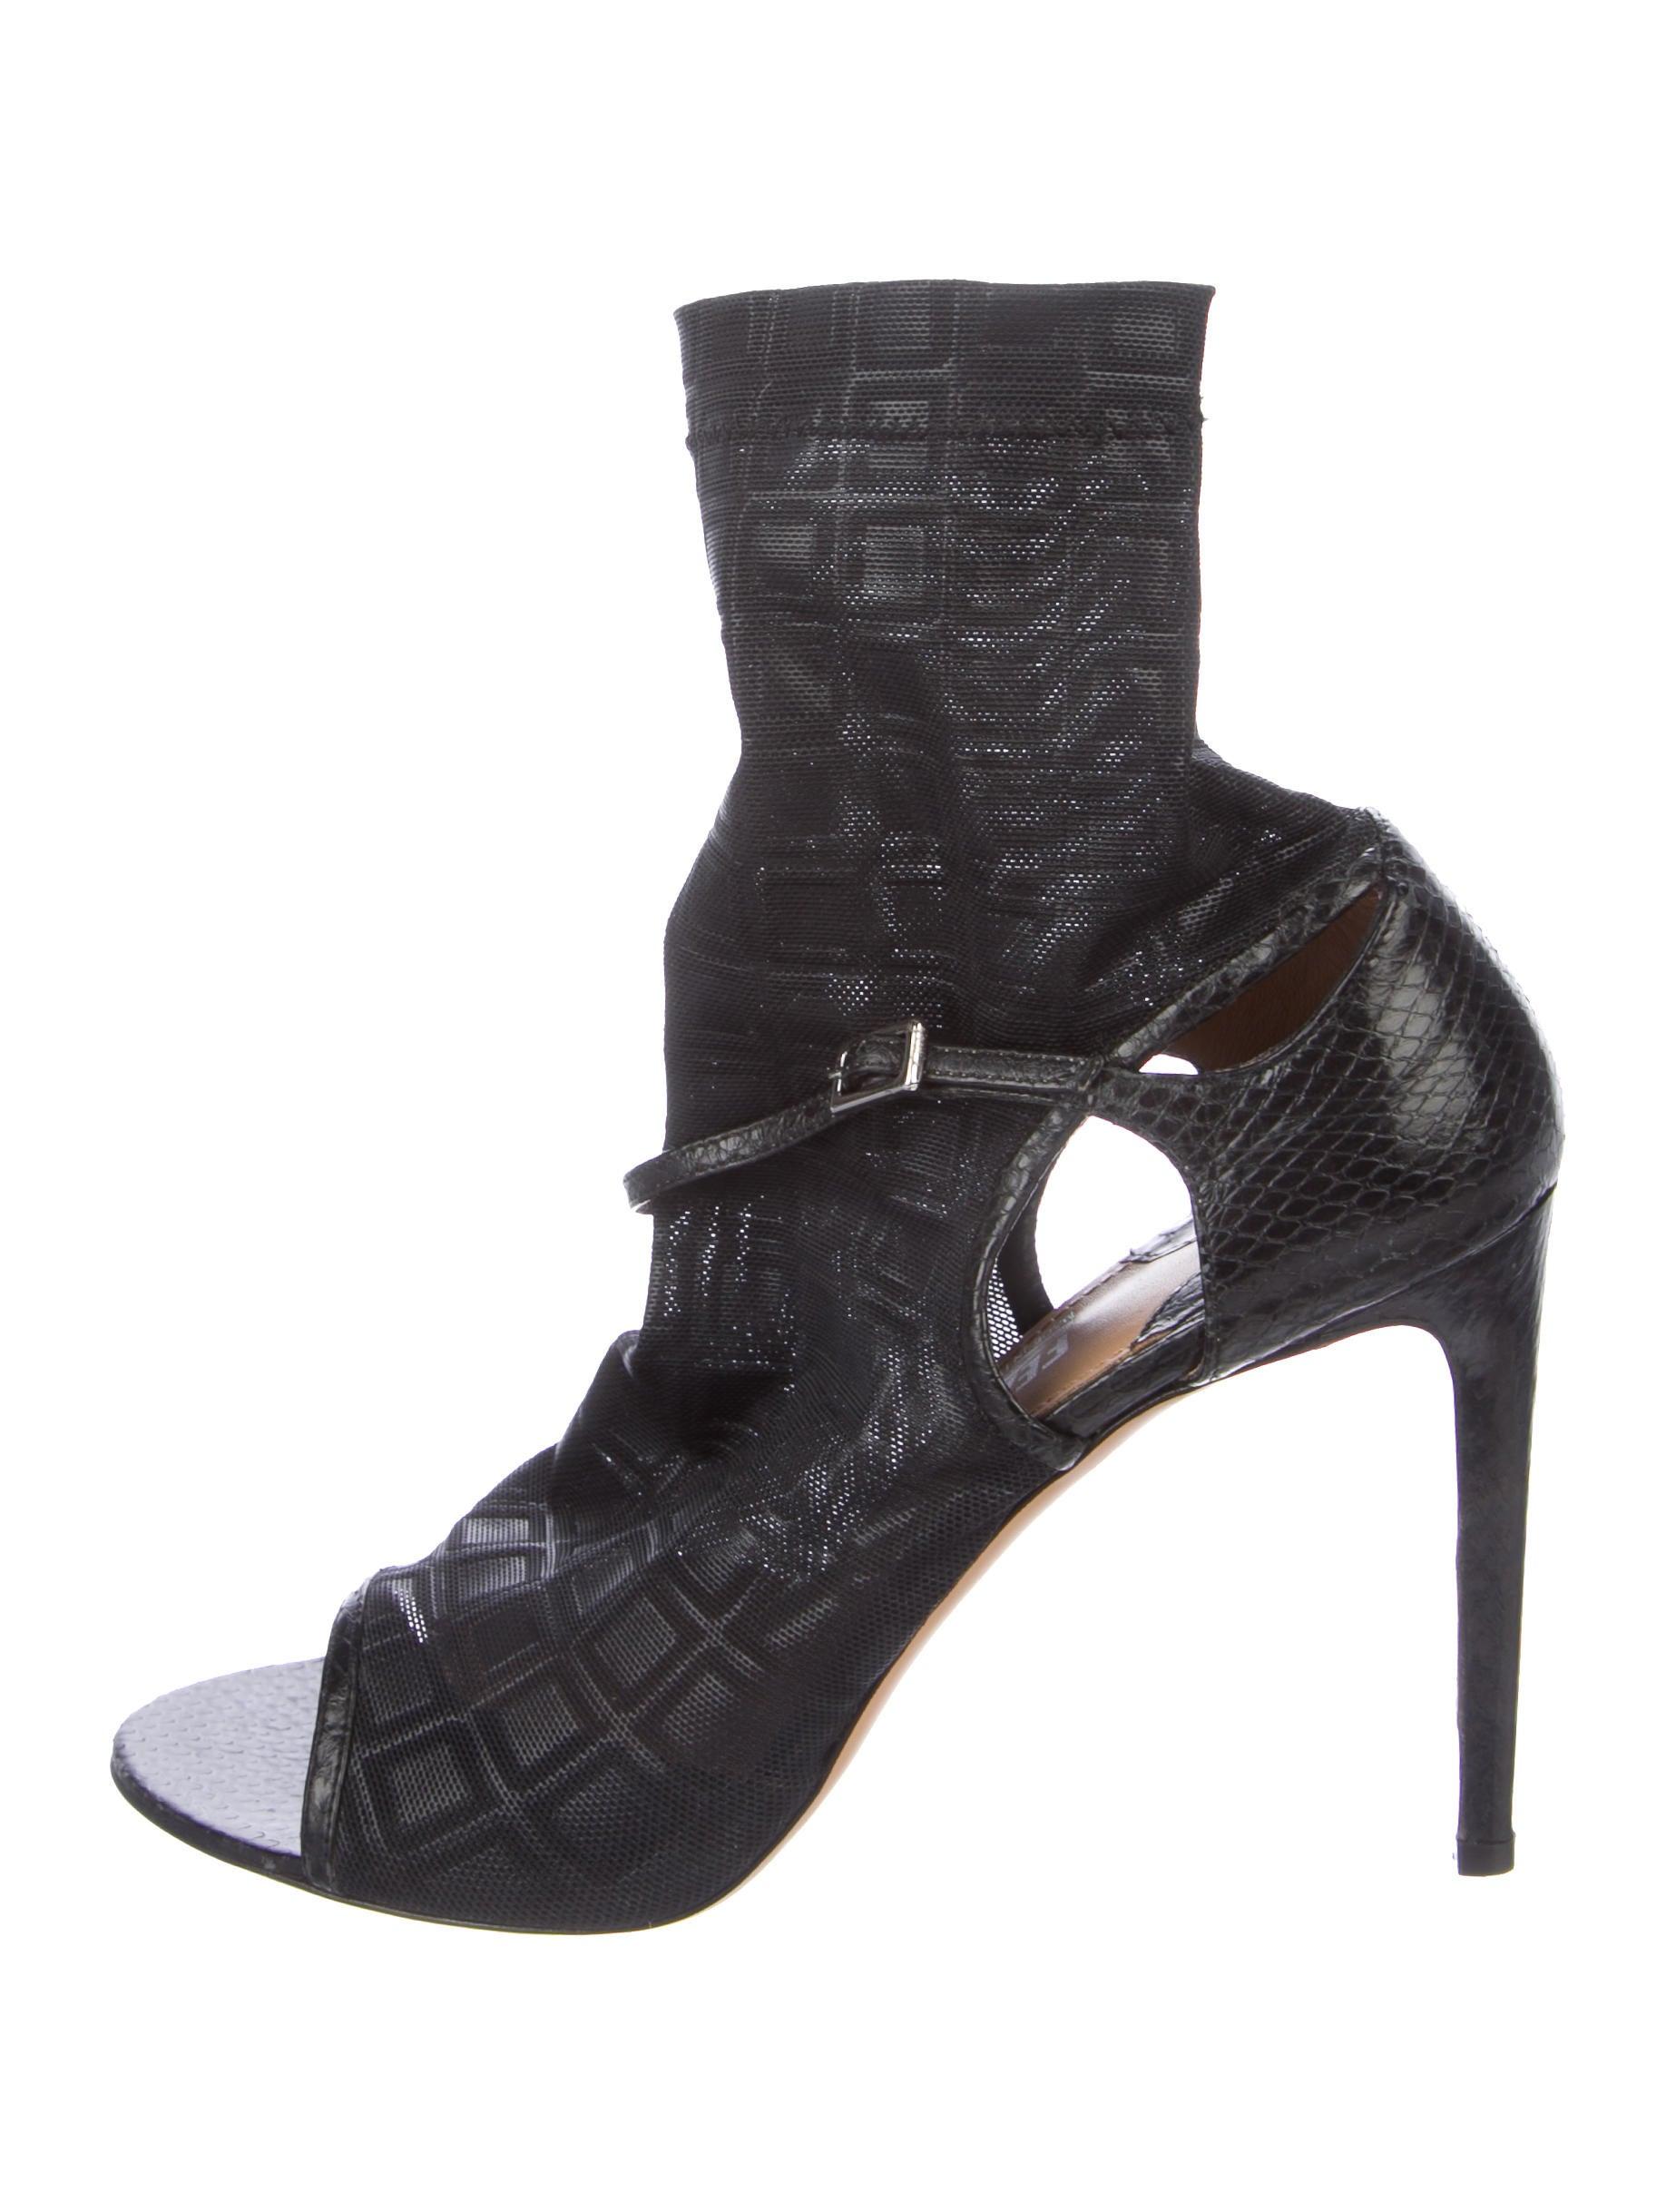 Salvatore Ferragamo Mesh Embossed Sandals footlocker cheap online oLqFlN67m